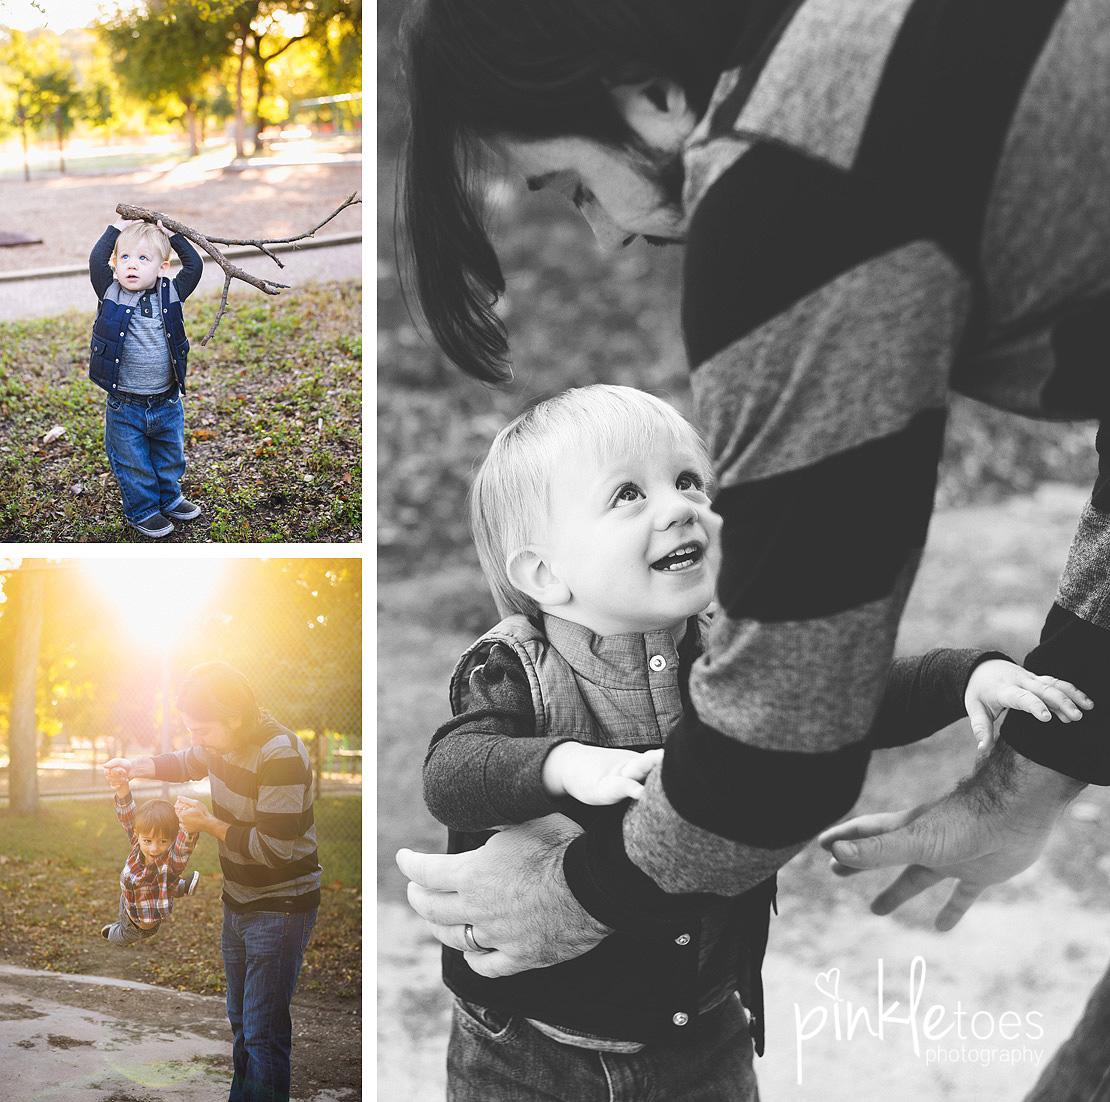 austin-lifestyle-candid-kids-photography-13